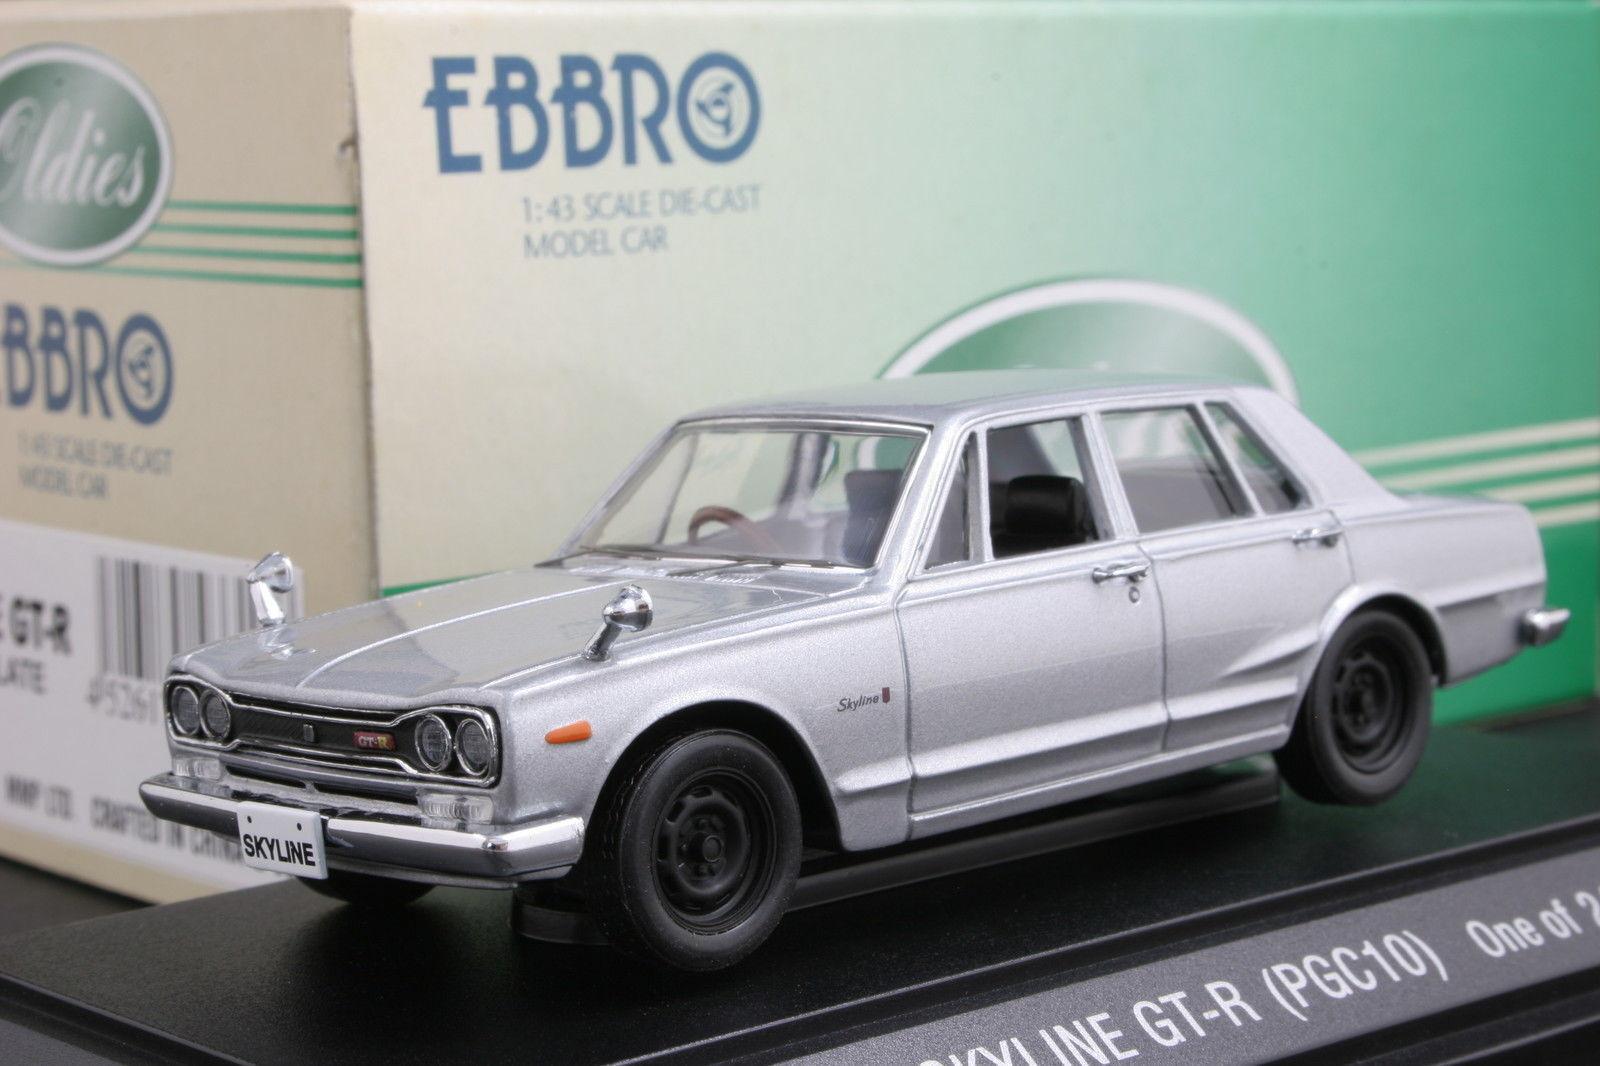 Ebbro 43317 1 43 Scale Nissan Nissan Nissan Skyline GT-R PGC10 (Late Version) Die Cast Model 83810c